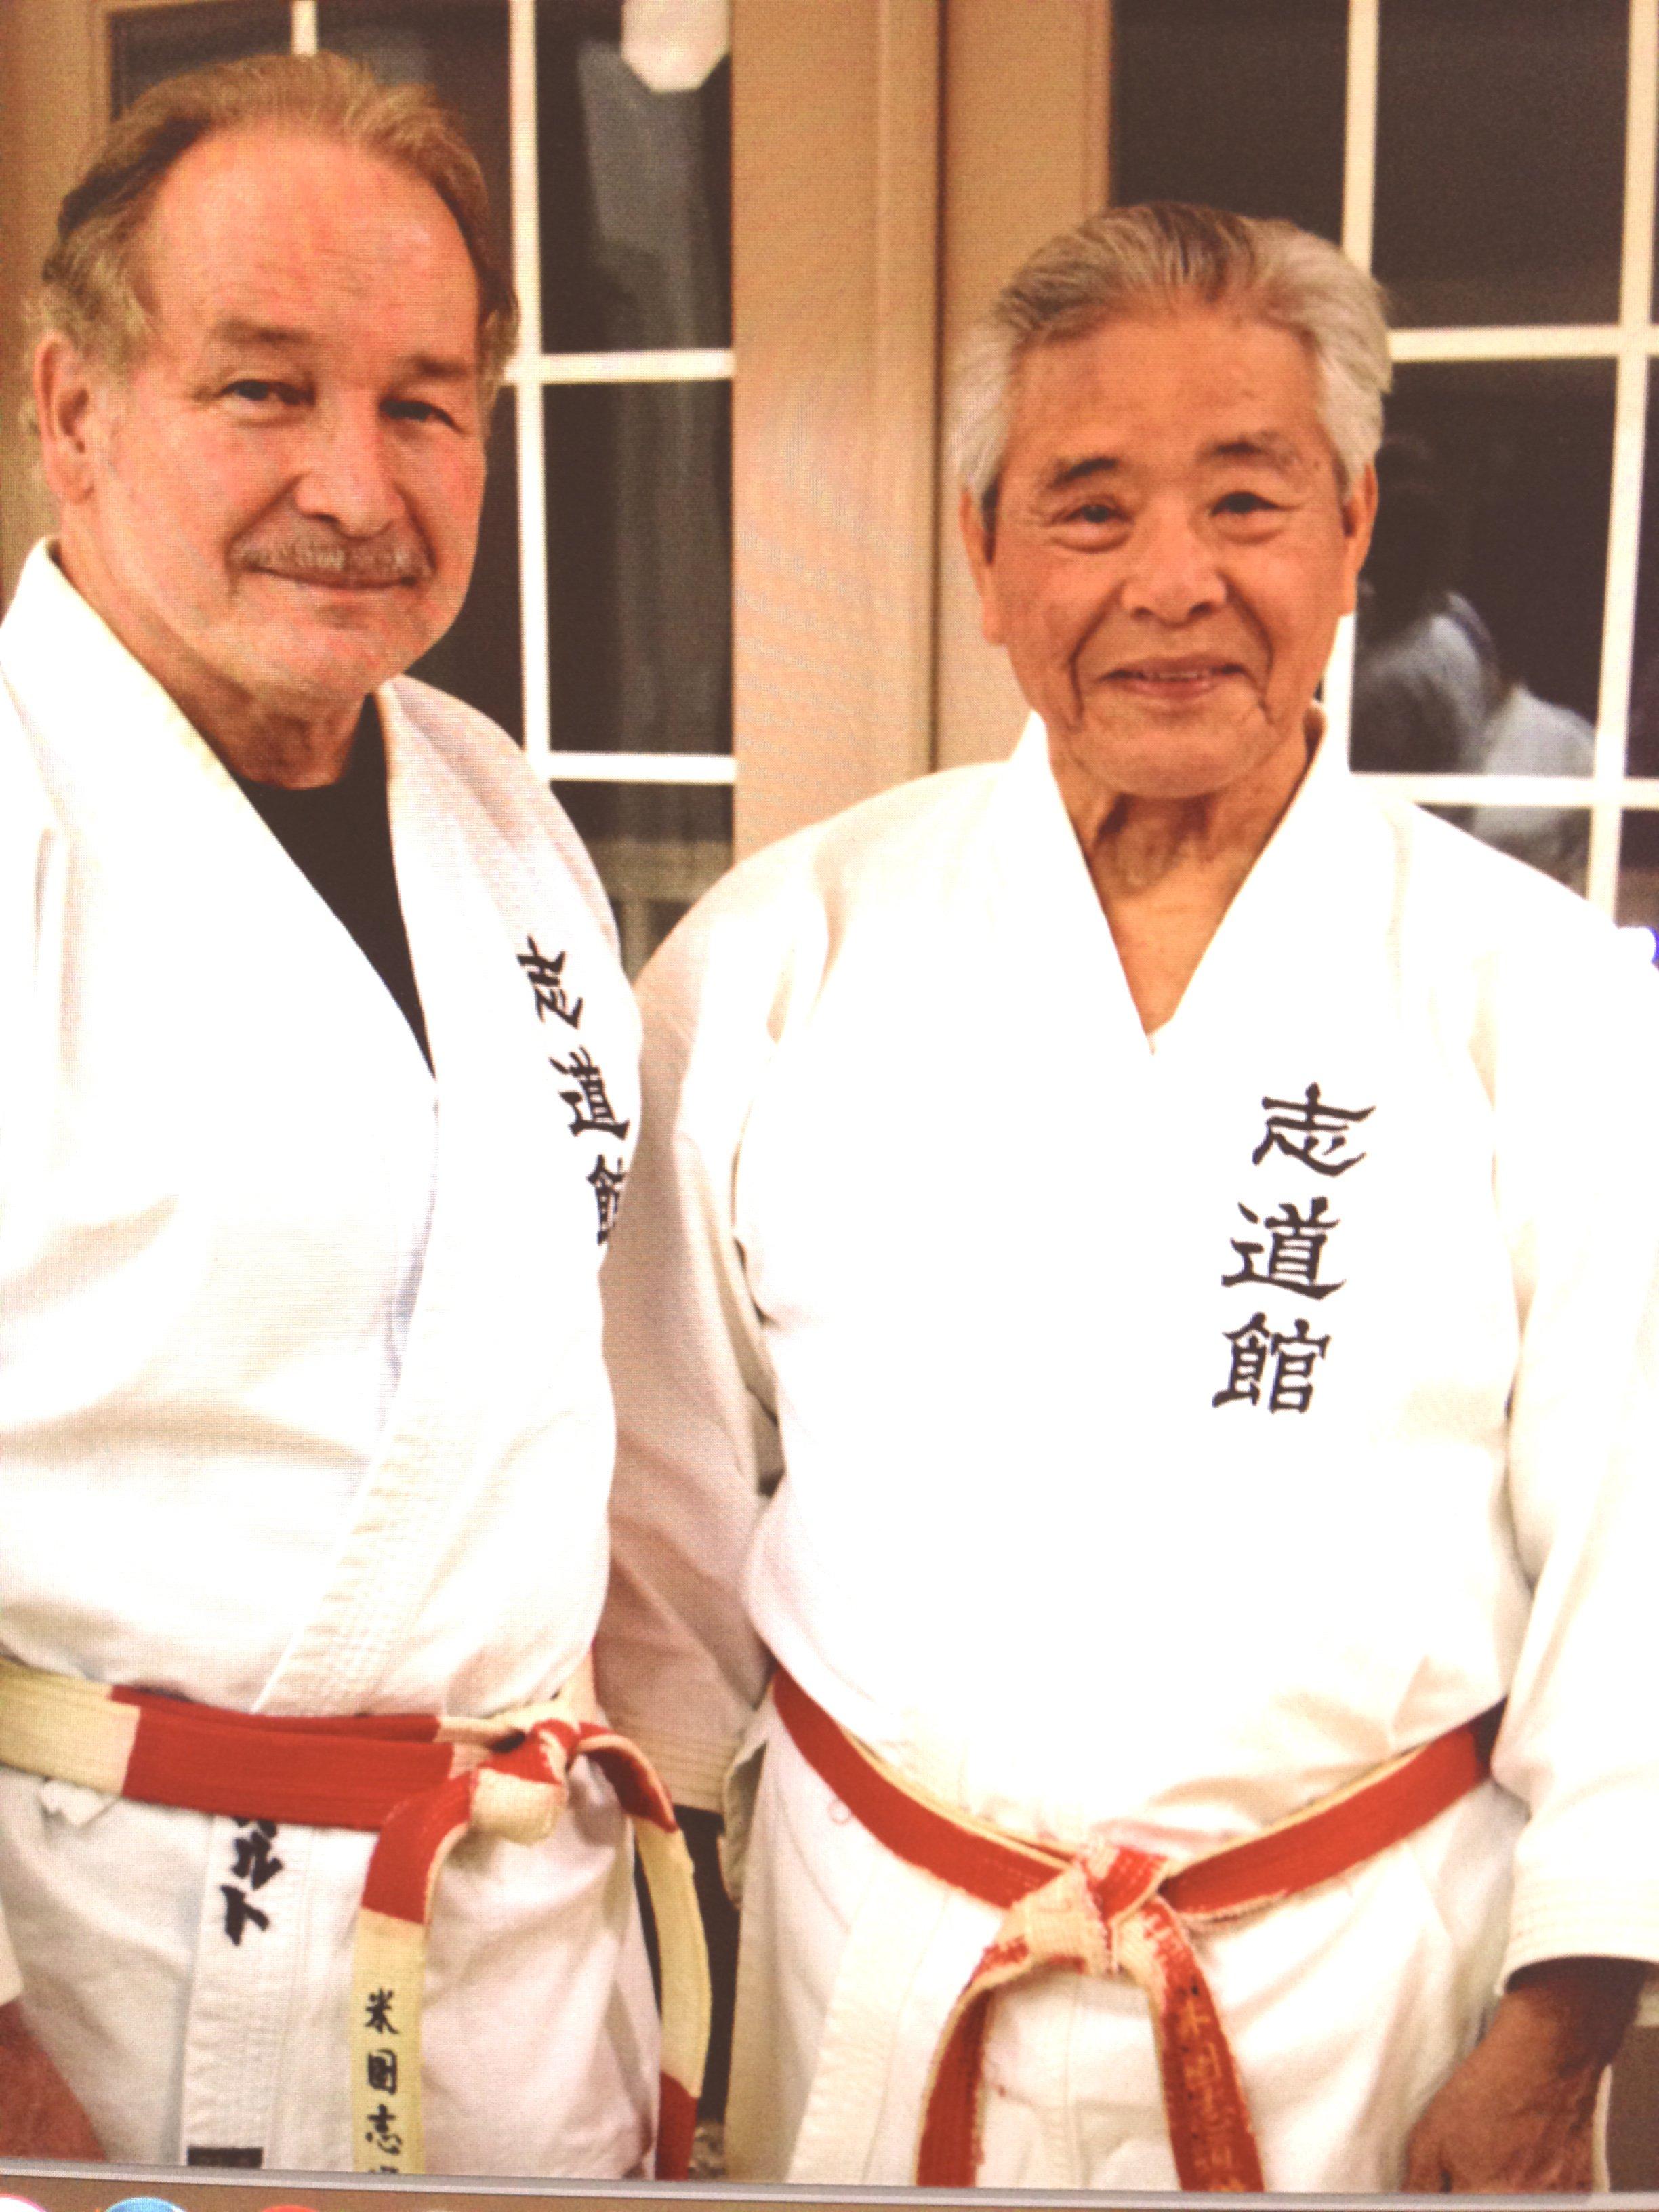 Grand Master Seikichi Iha, 10th Degree, and Roberto Curtis, 8th Degree